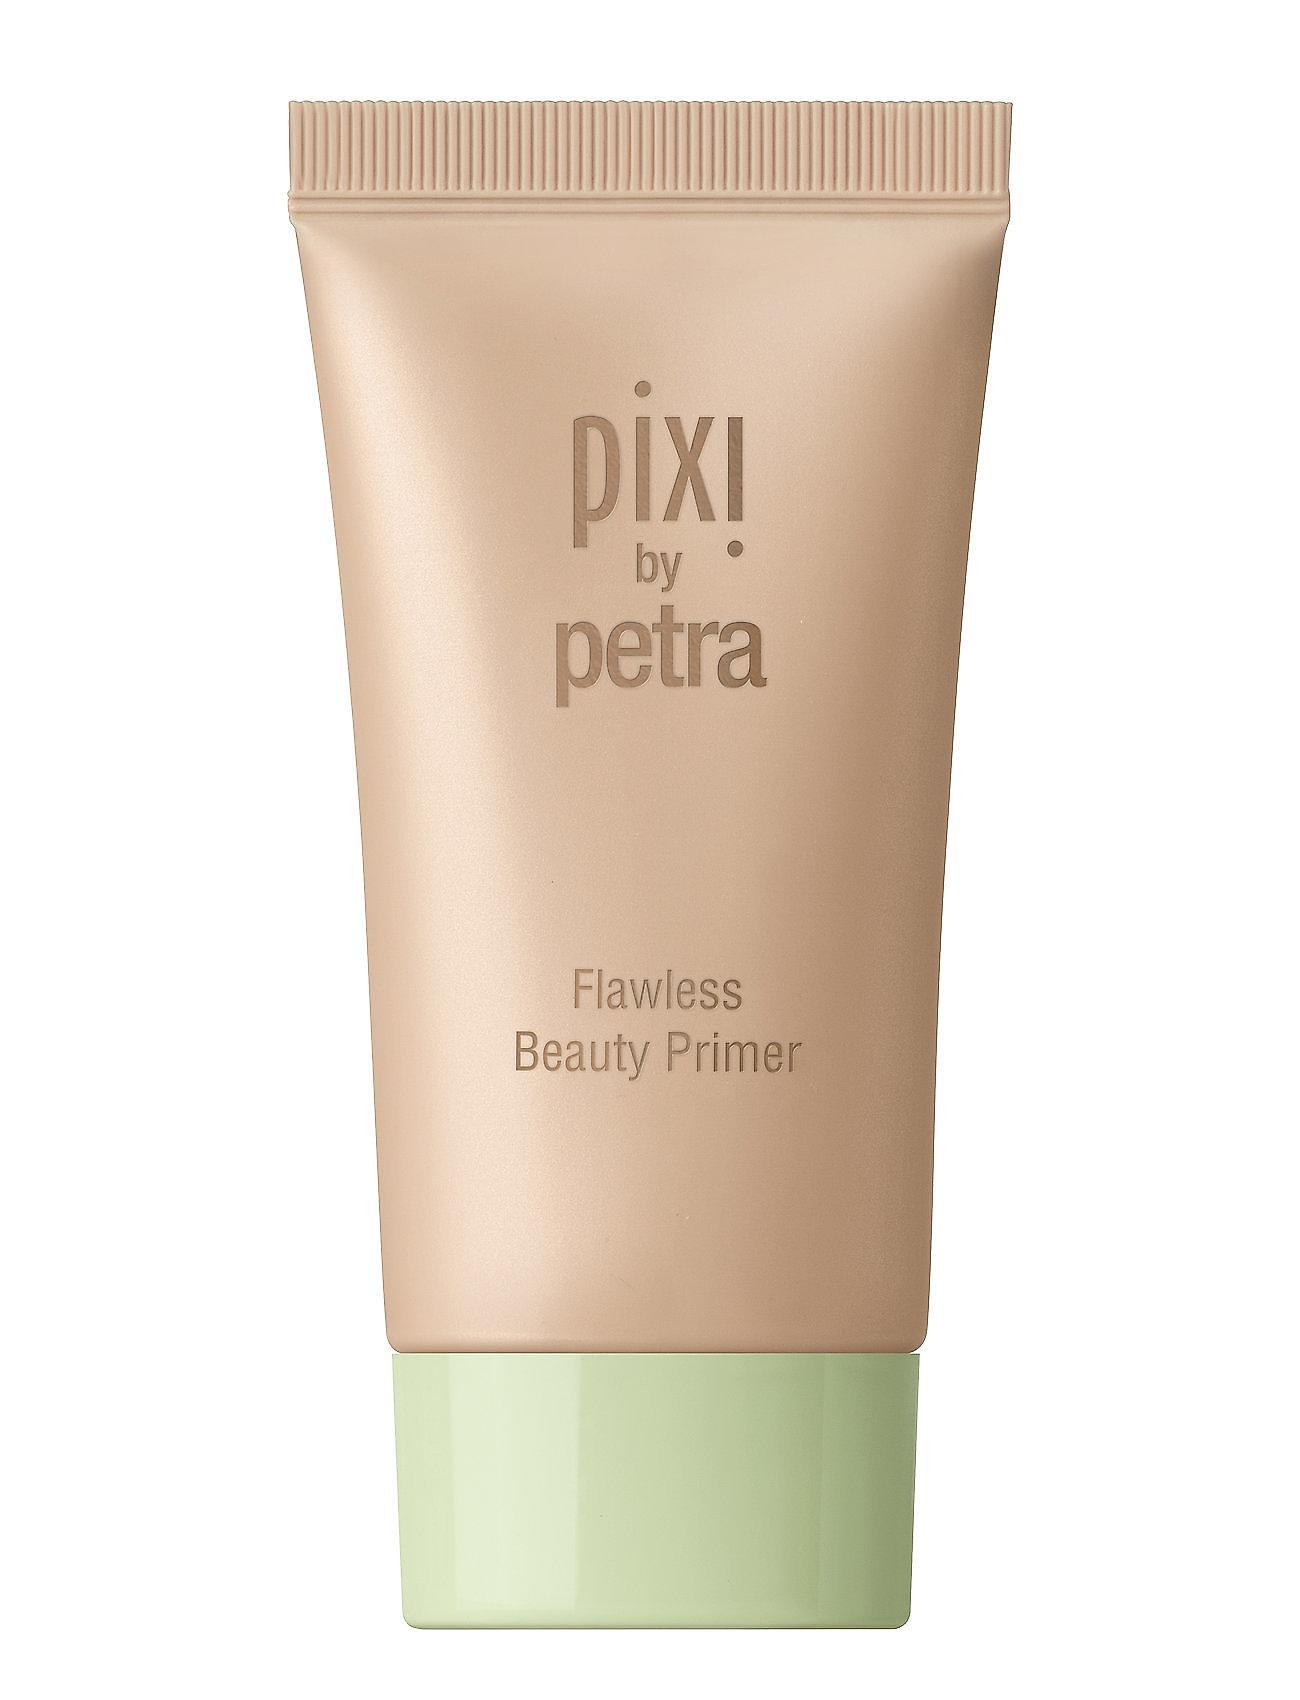 Image of Flawless Beauty Primer Makeupprimer Makeup Pixi (3215648813)